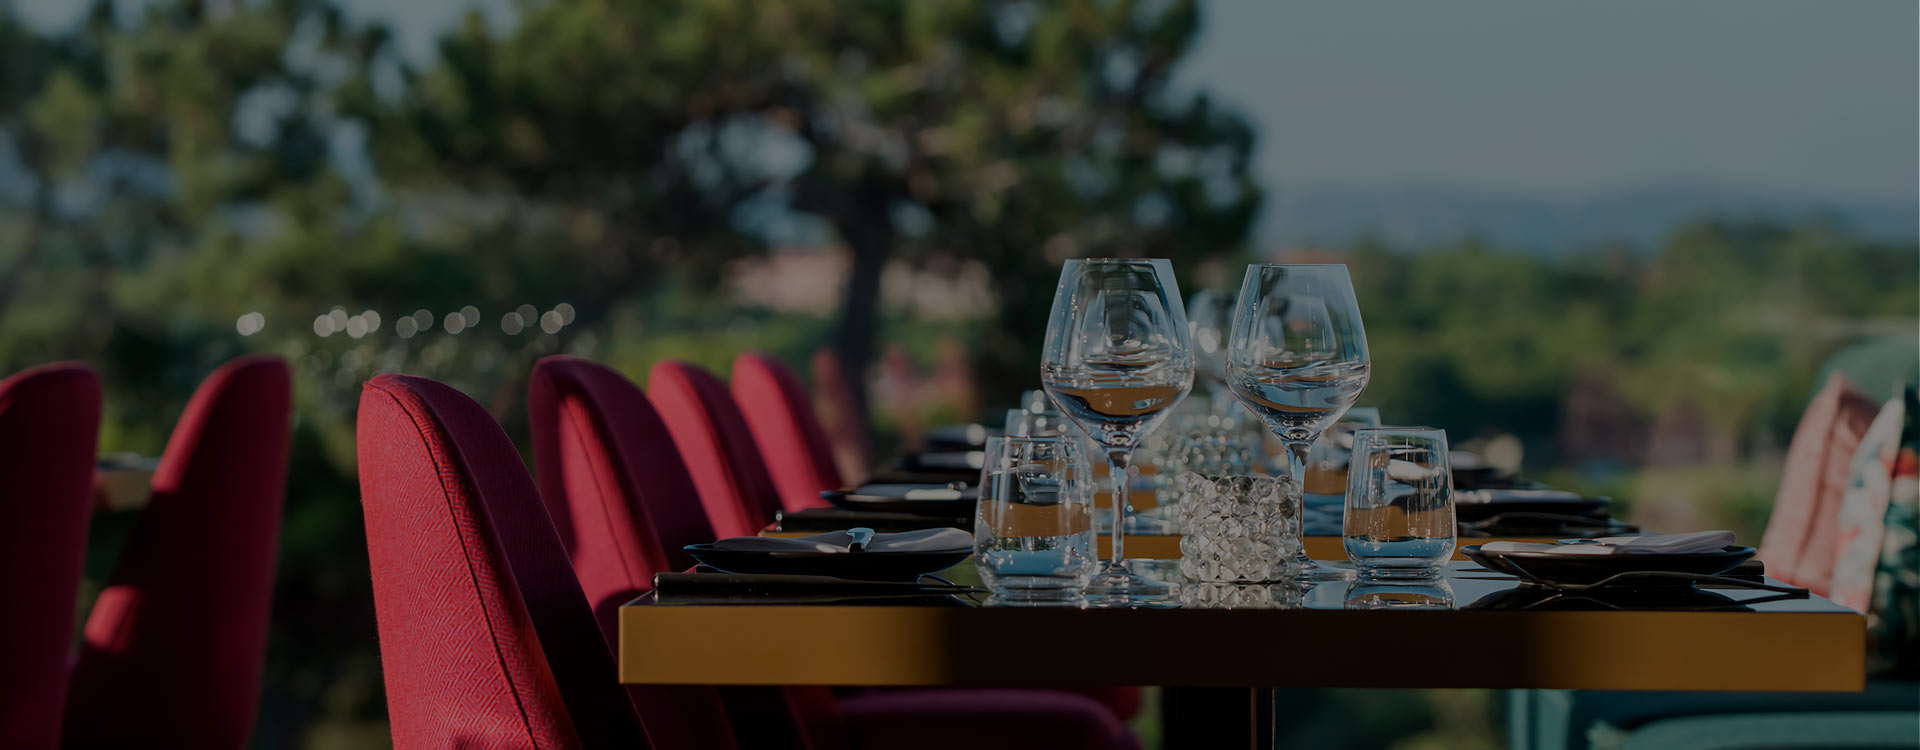 Amara Restaurant - Love